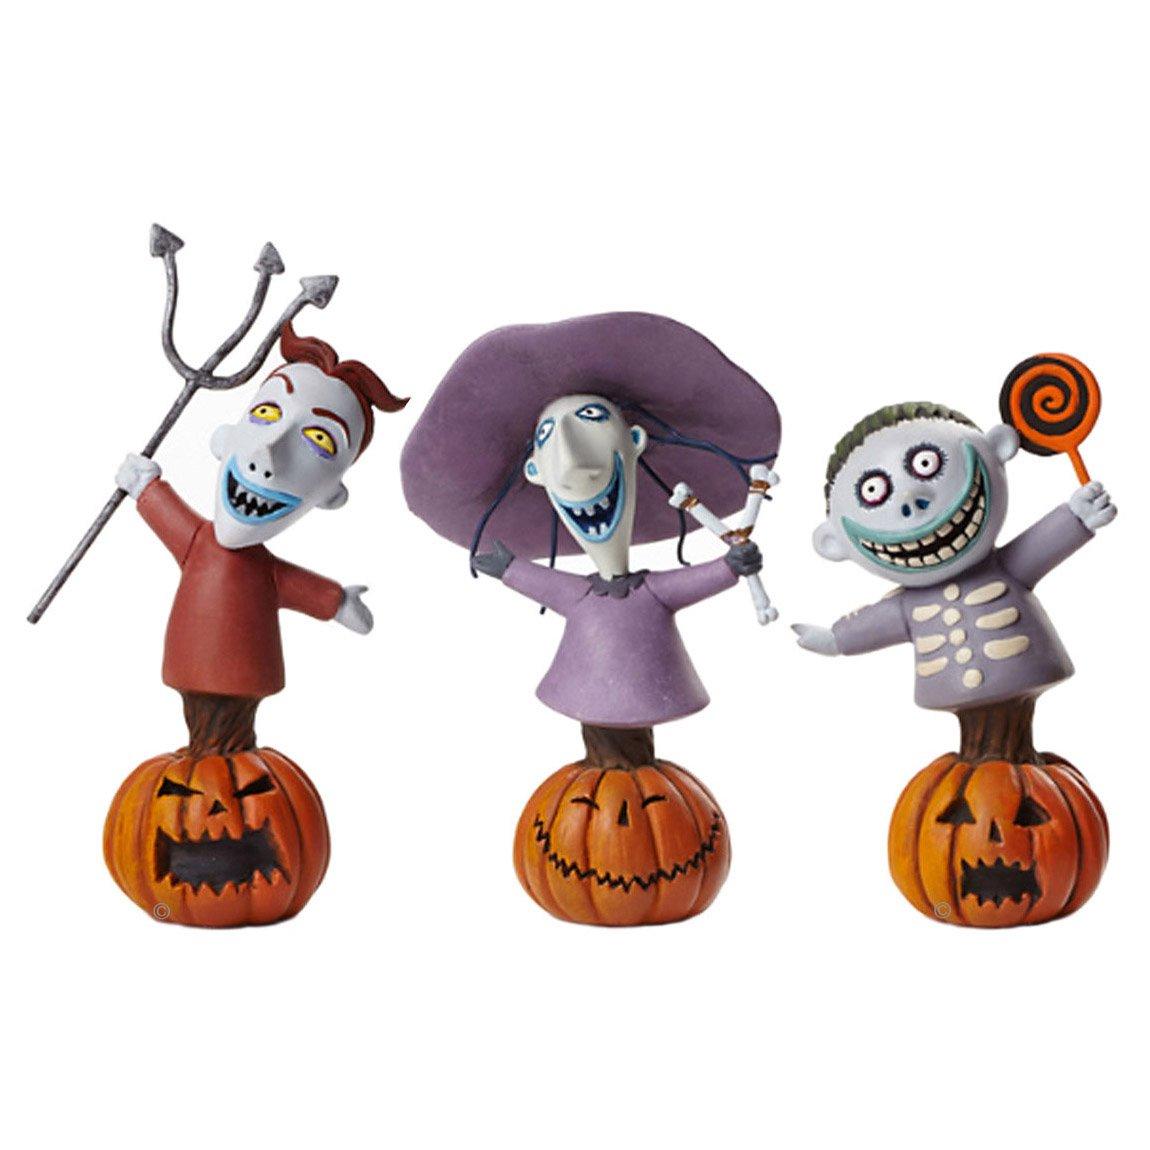 Grand Jester Disney NBC Lock, Shock and Barrel Figurines Set of 3 - Enesco